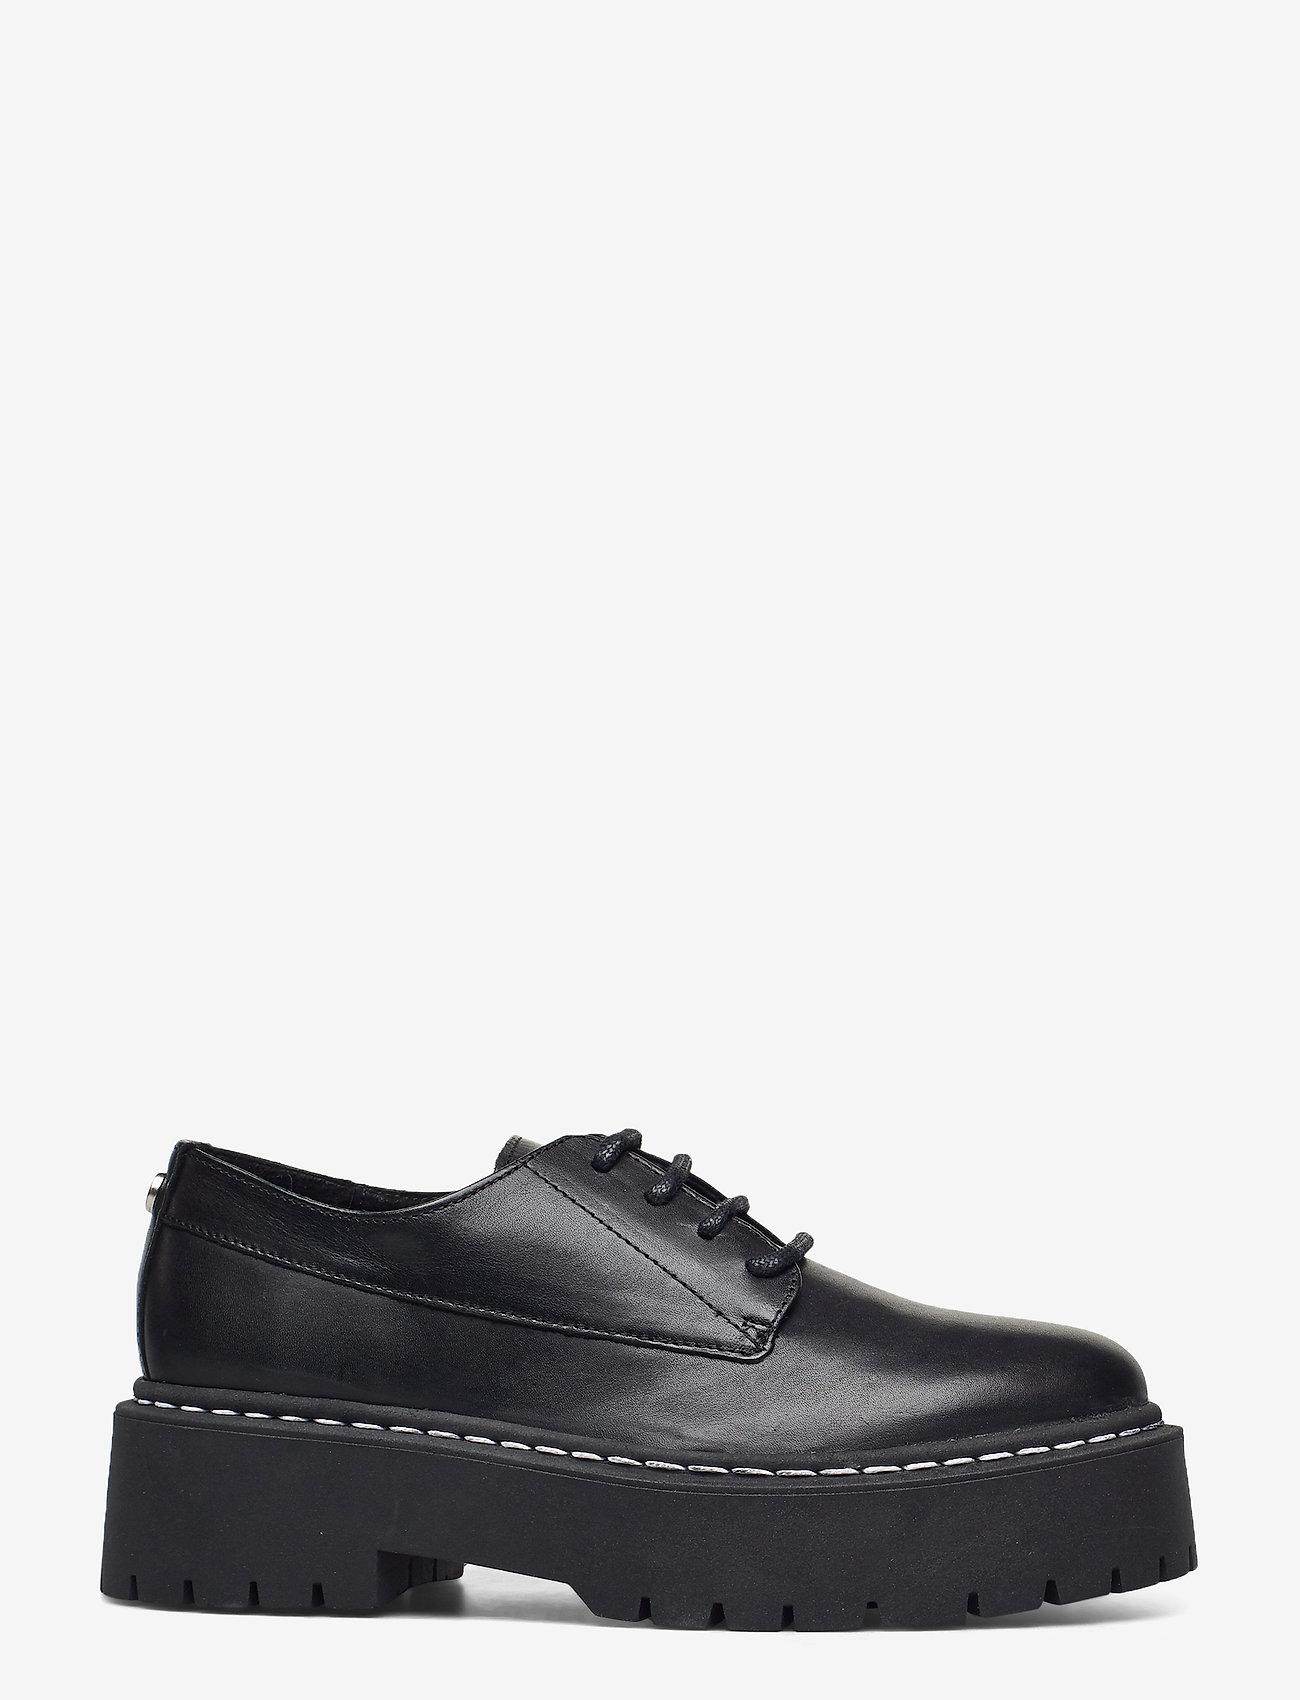 Steve Madden - Vlokke - snörskor - black leather - 1